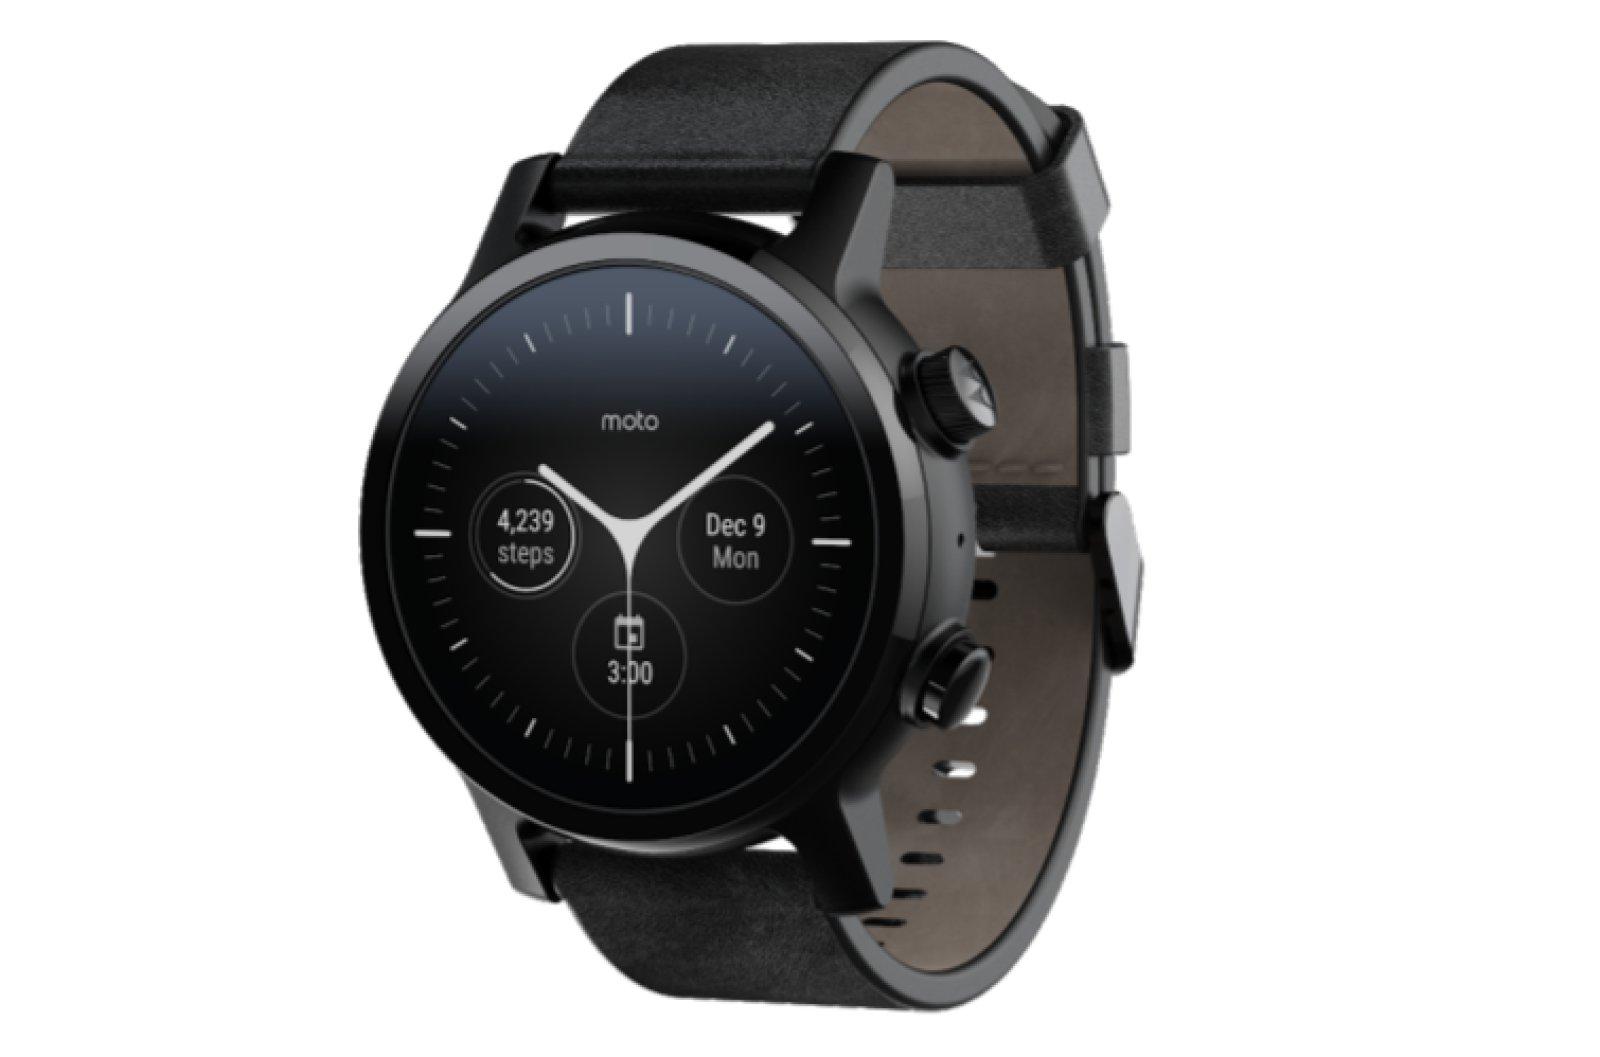 Photo of ساعة Moto 360 تعود للمنافسة في الأسواق مع معالج Wear 3100 وسعر 350 دولار